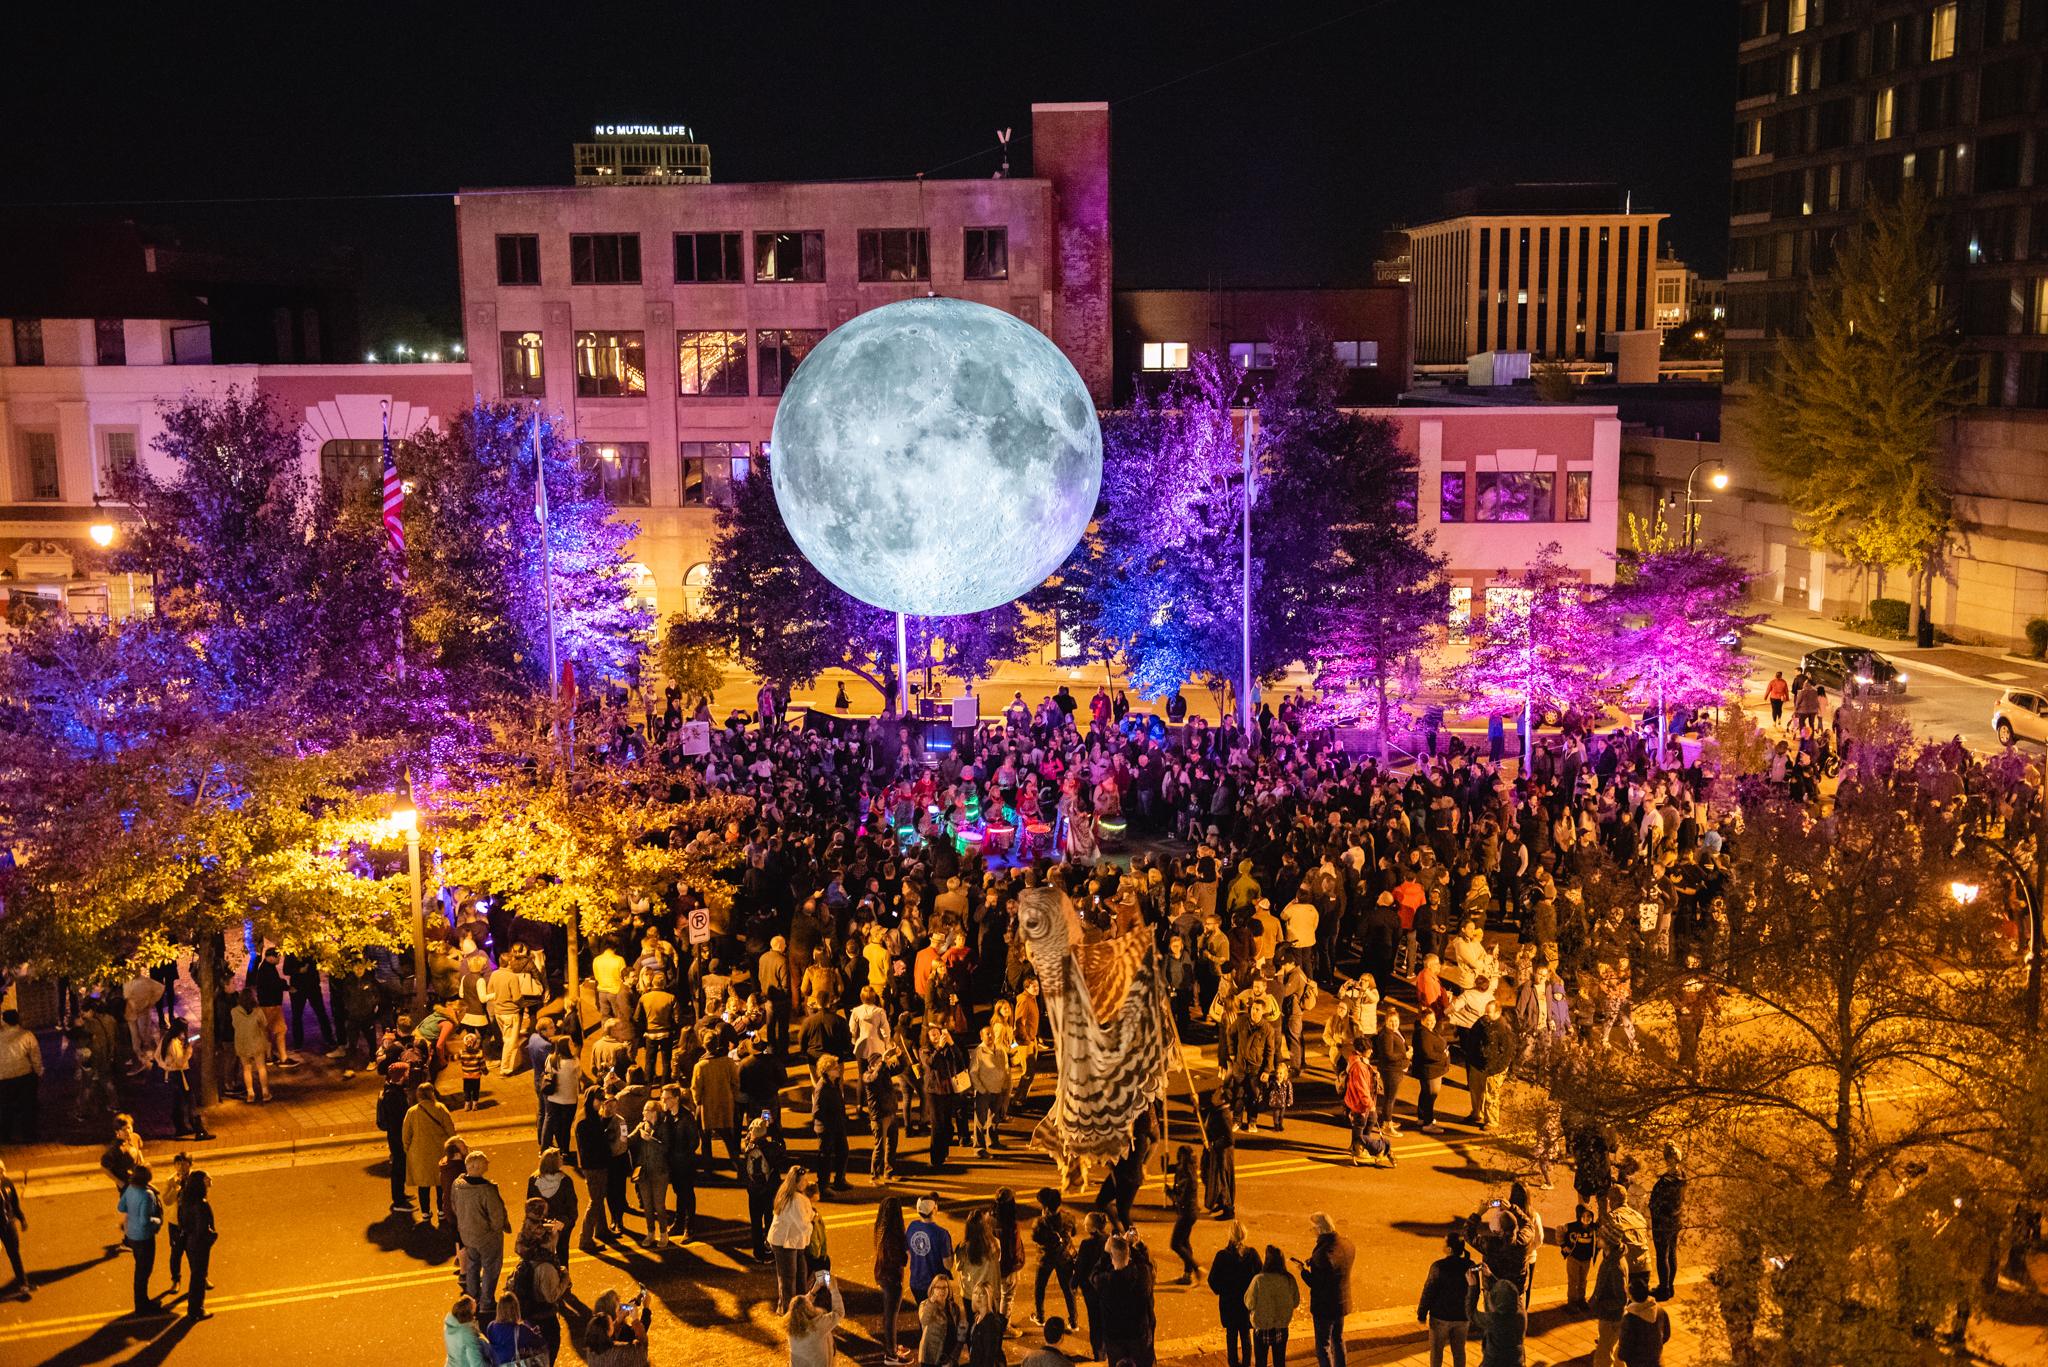 Bull Moon Rising and the Illumination of Historic Parrish Street